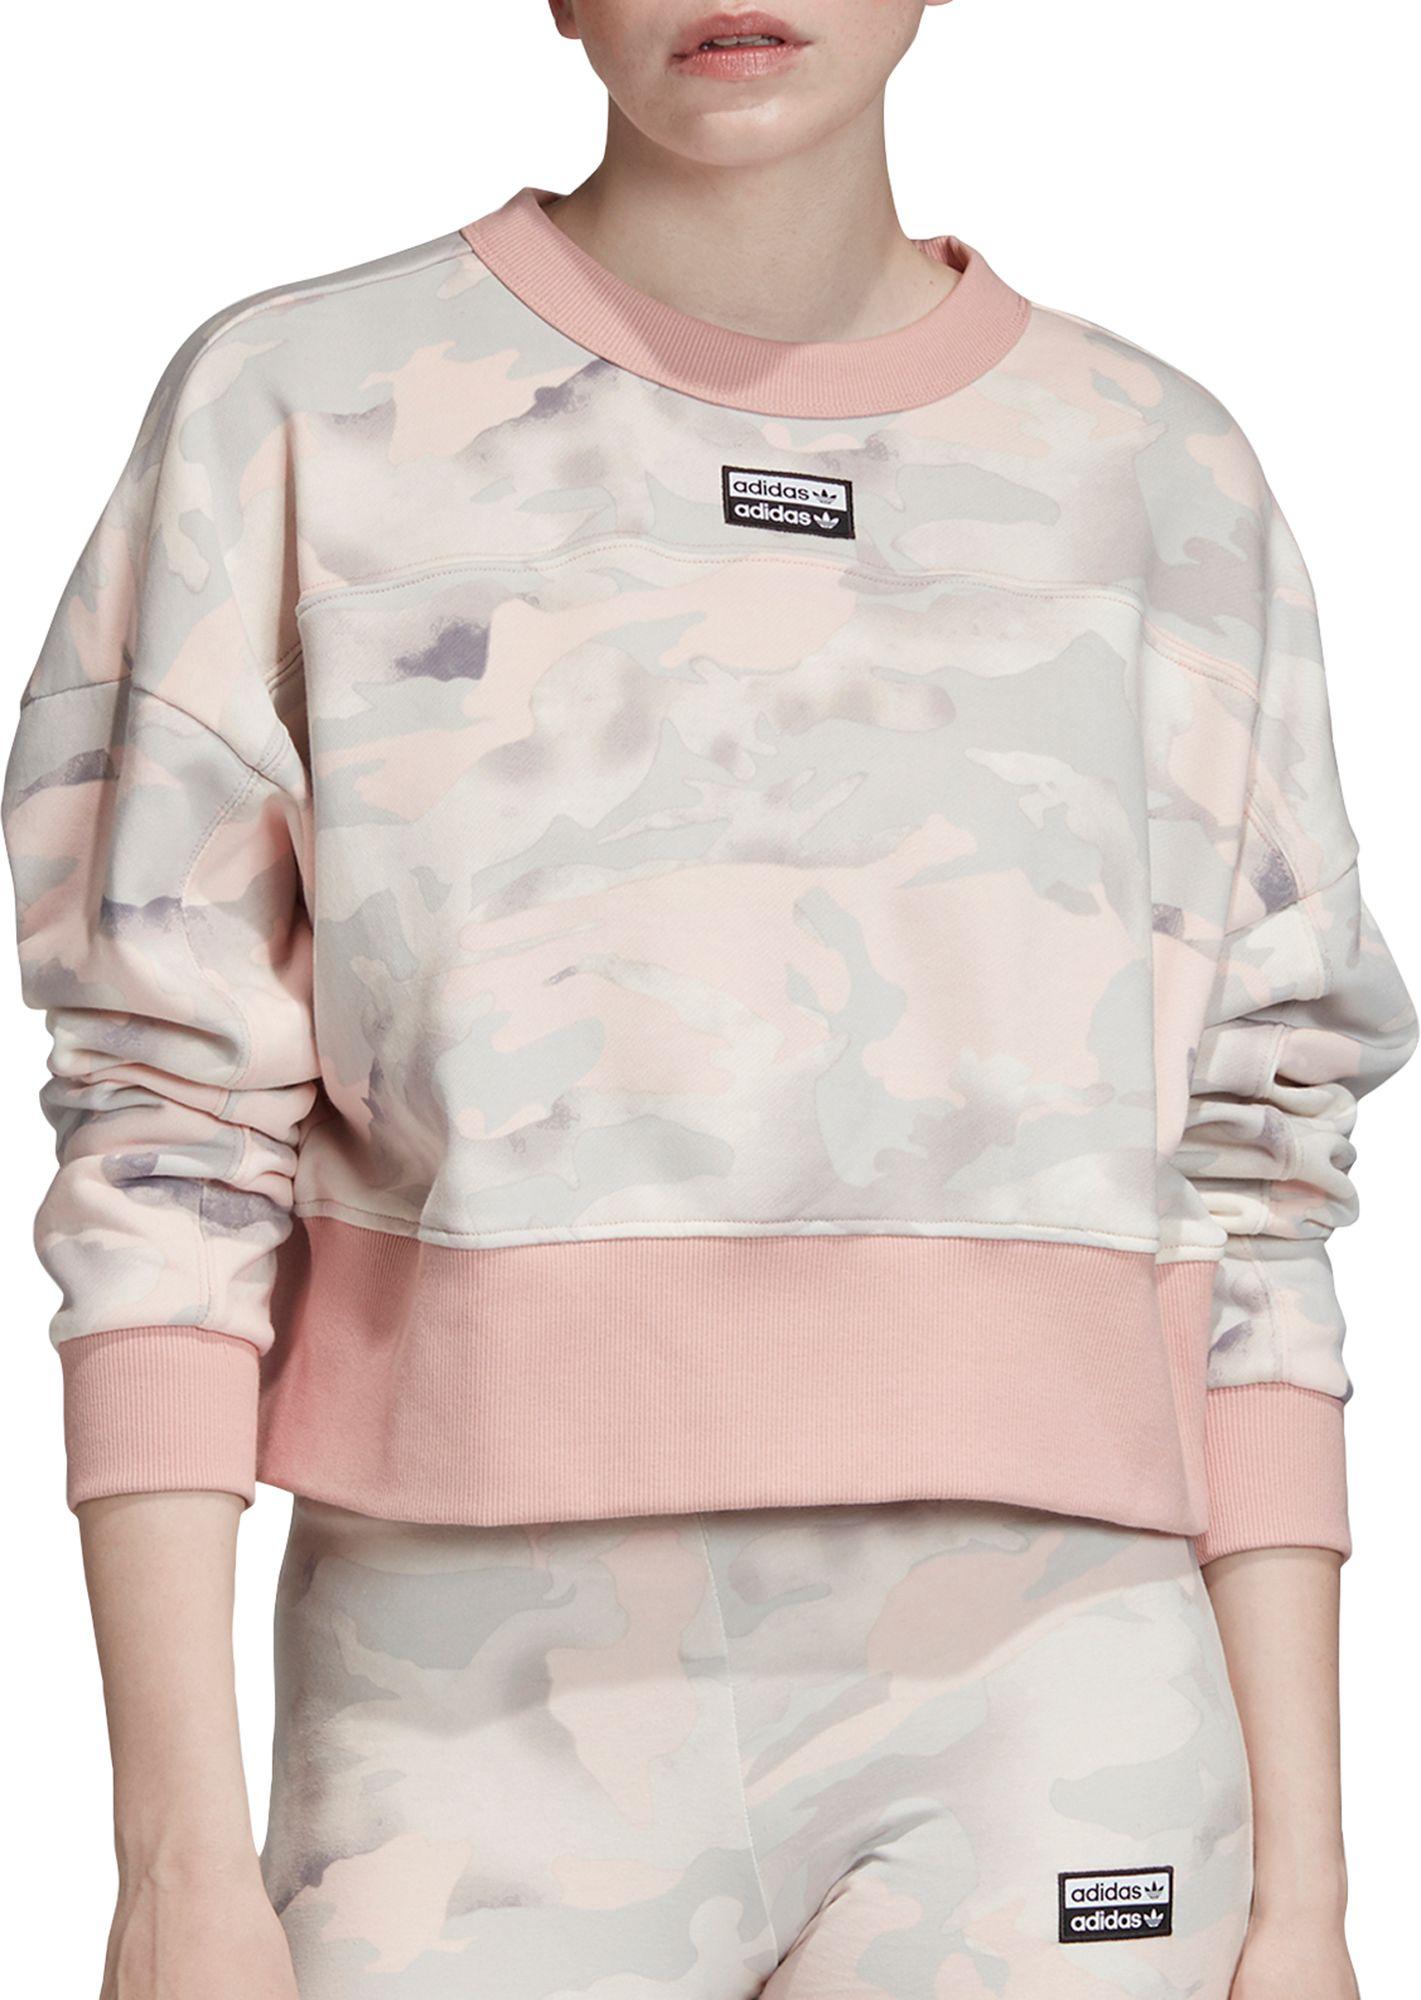 adidas Originals Women's Vocal Camo Cropped Crewneck Sweatshirt, Large, White